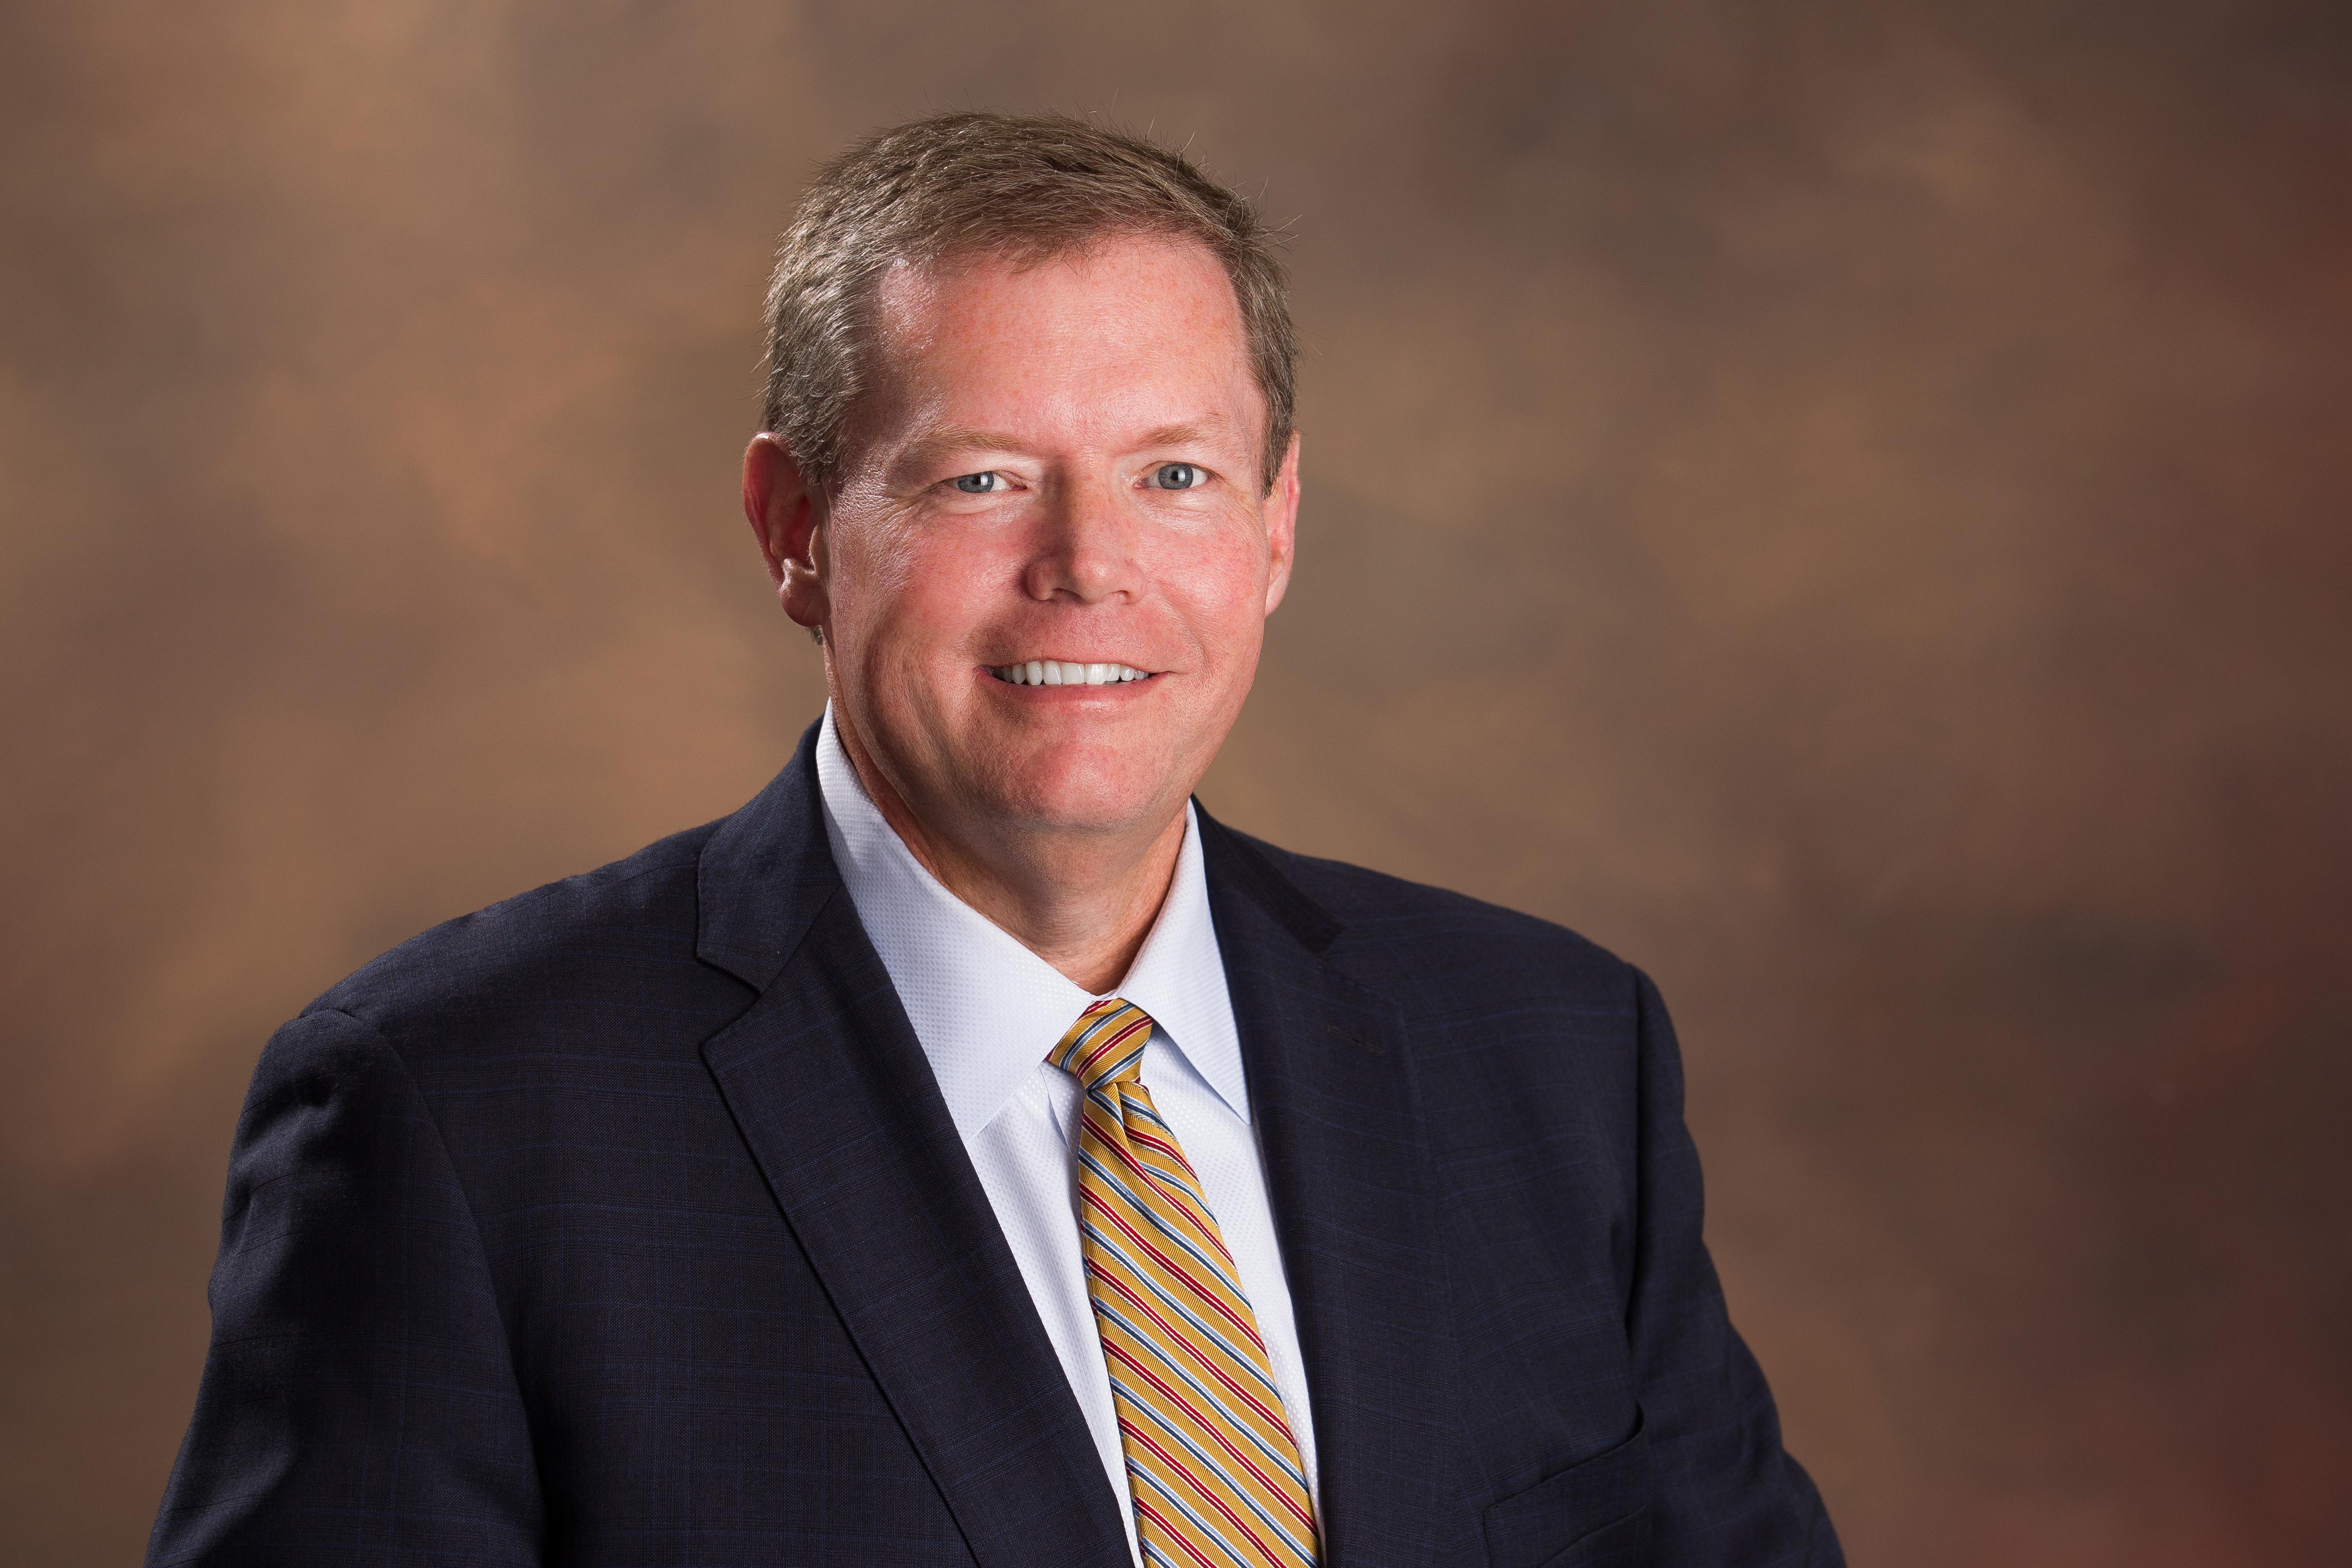 Brad Folsom Appointed to Valdosta-Lowndes County Development Authority